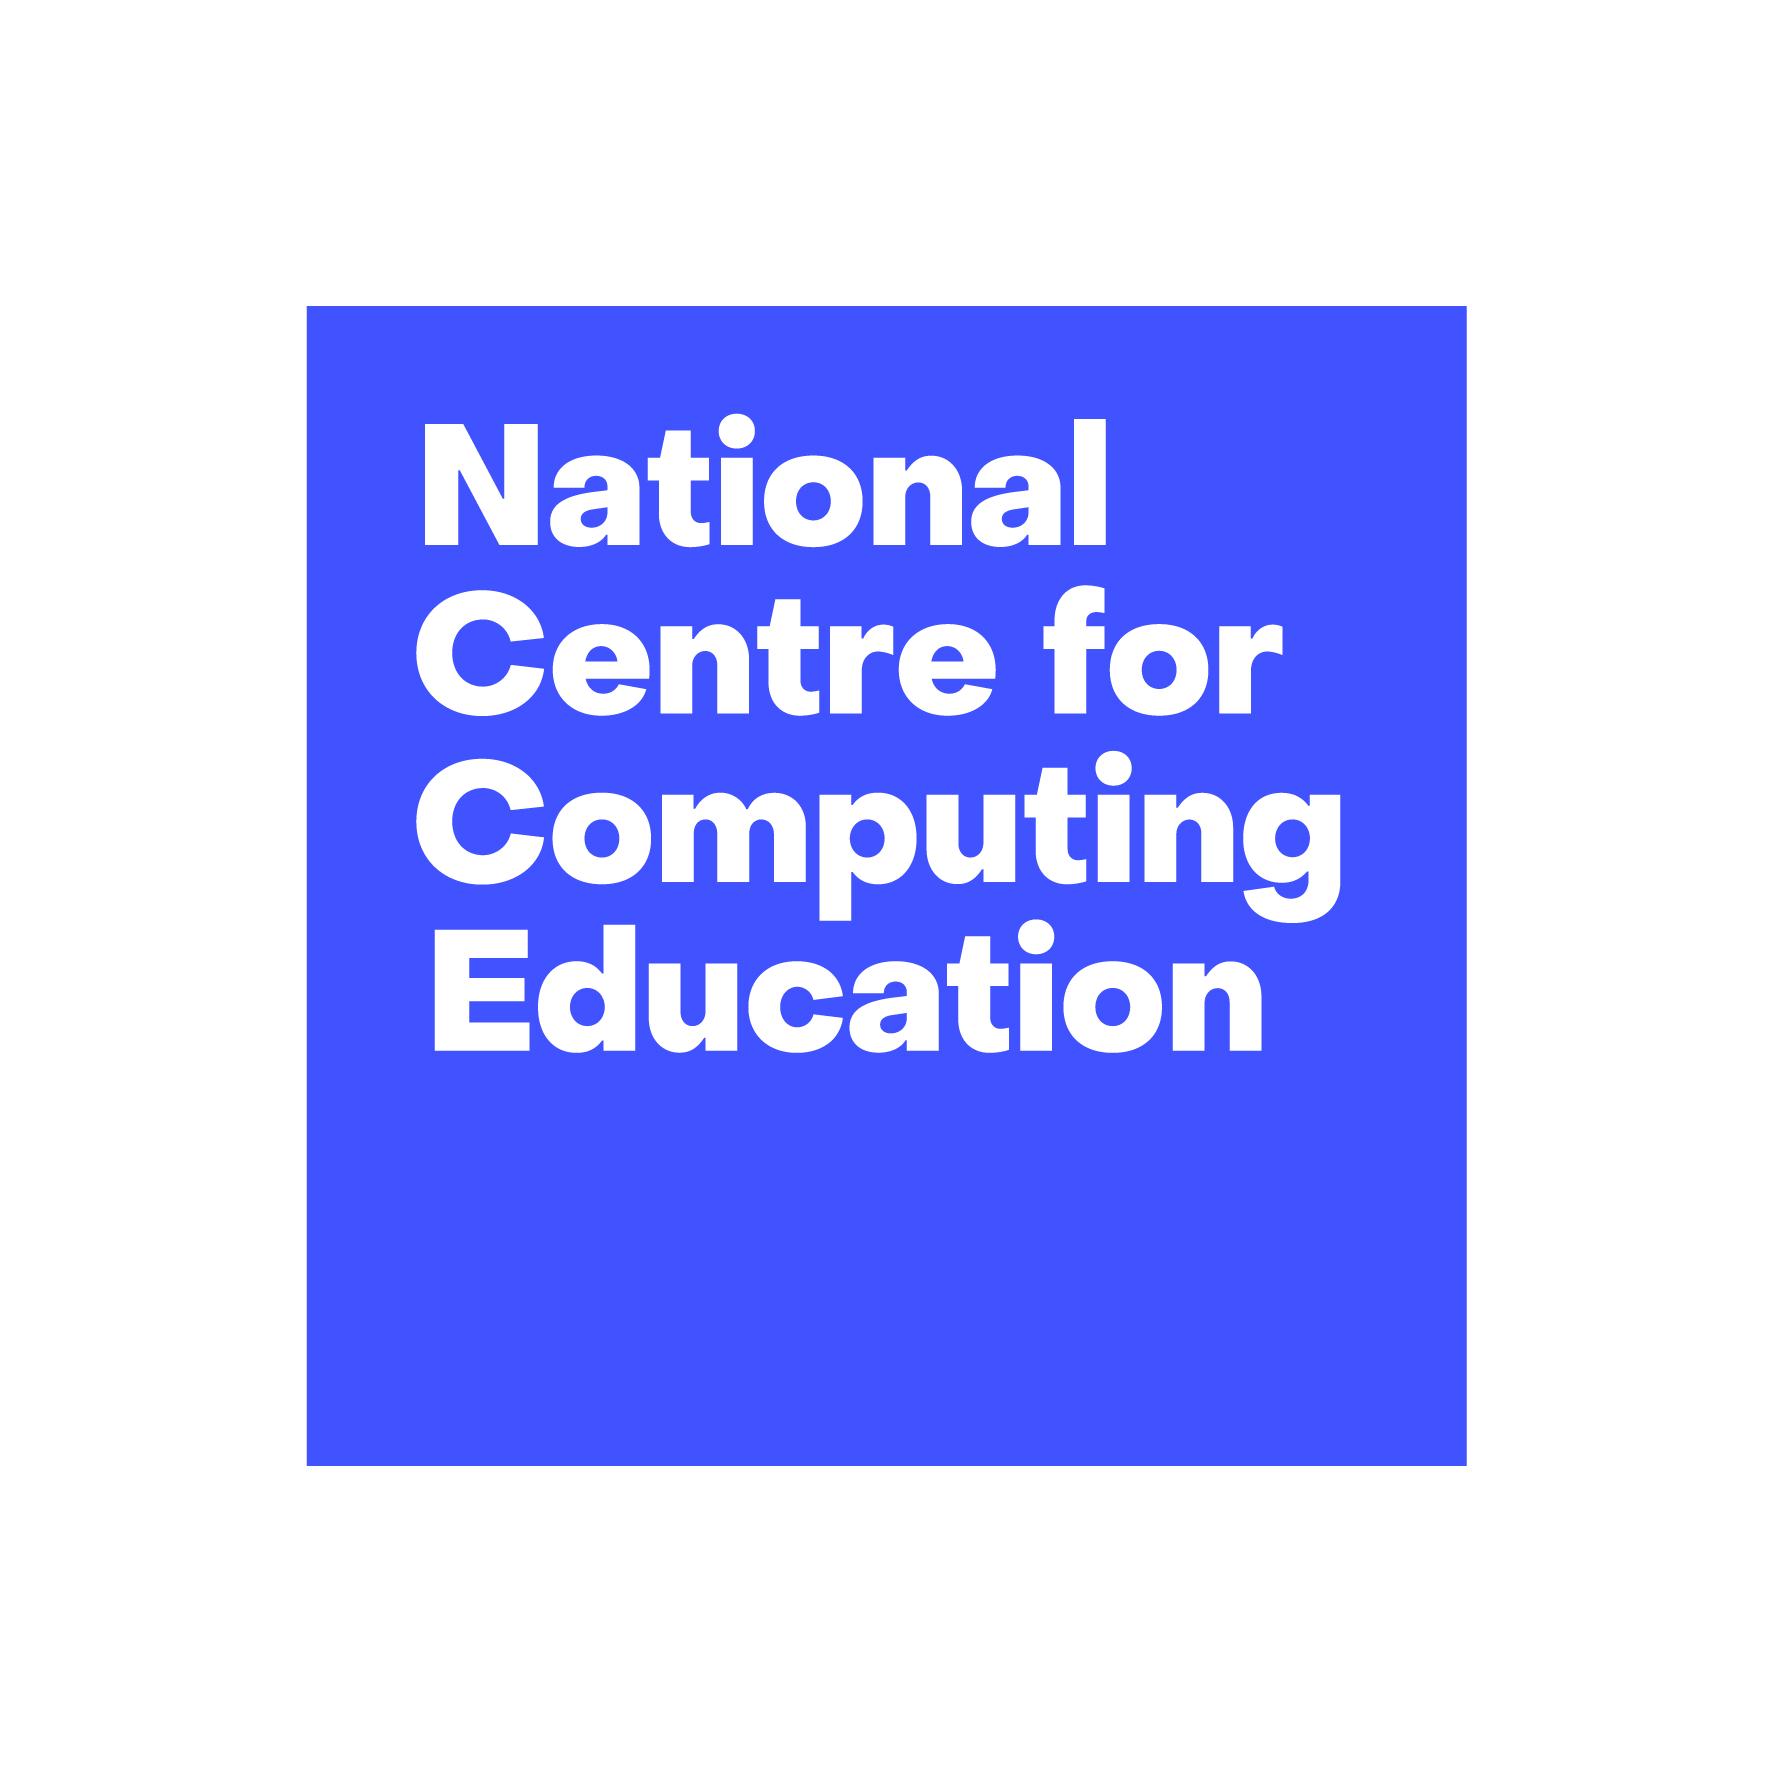 National Centre for Computing Education logo